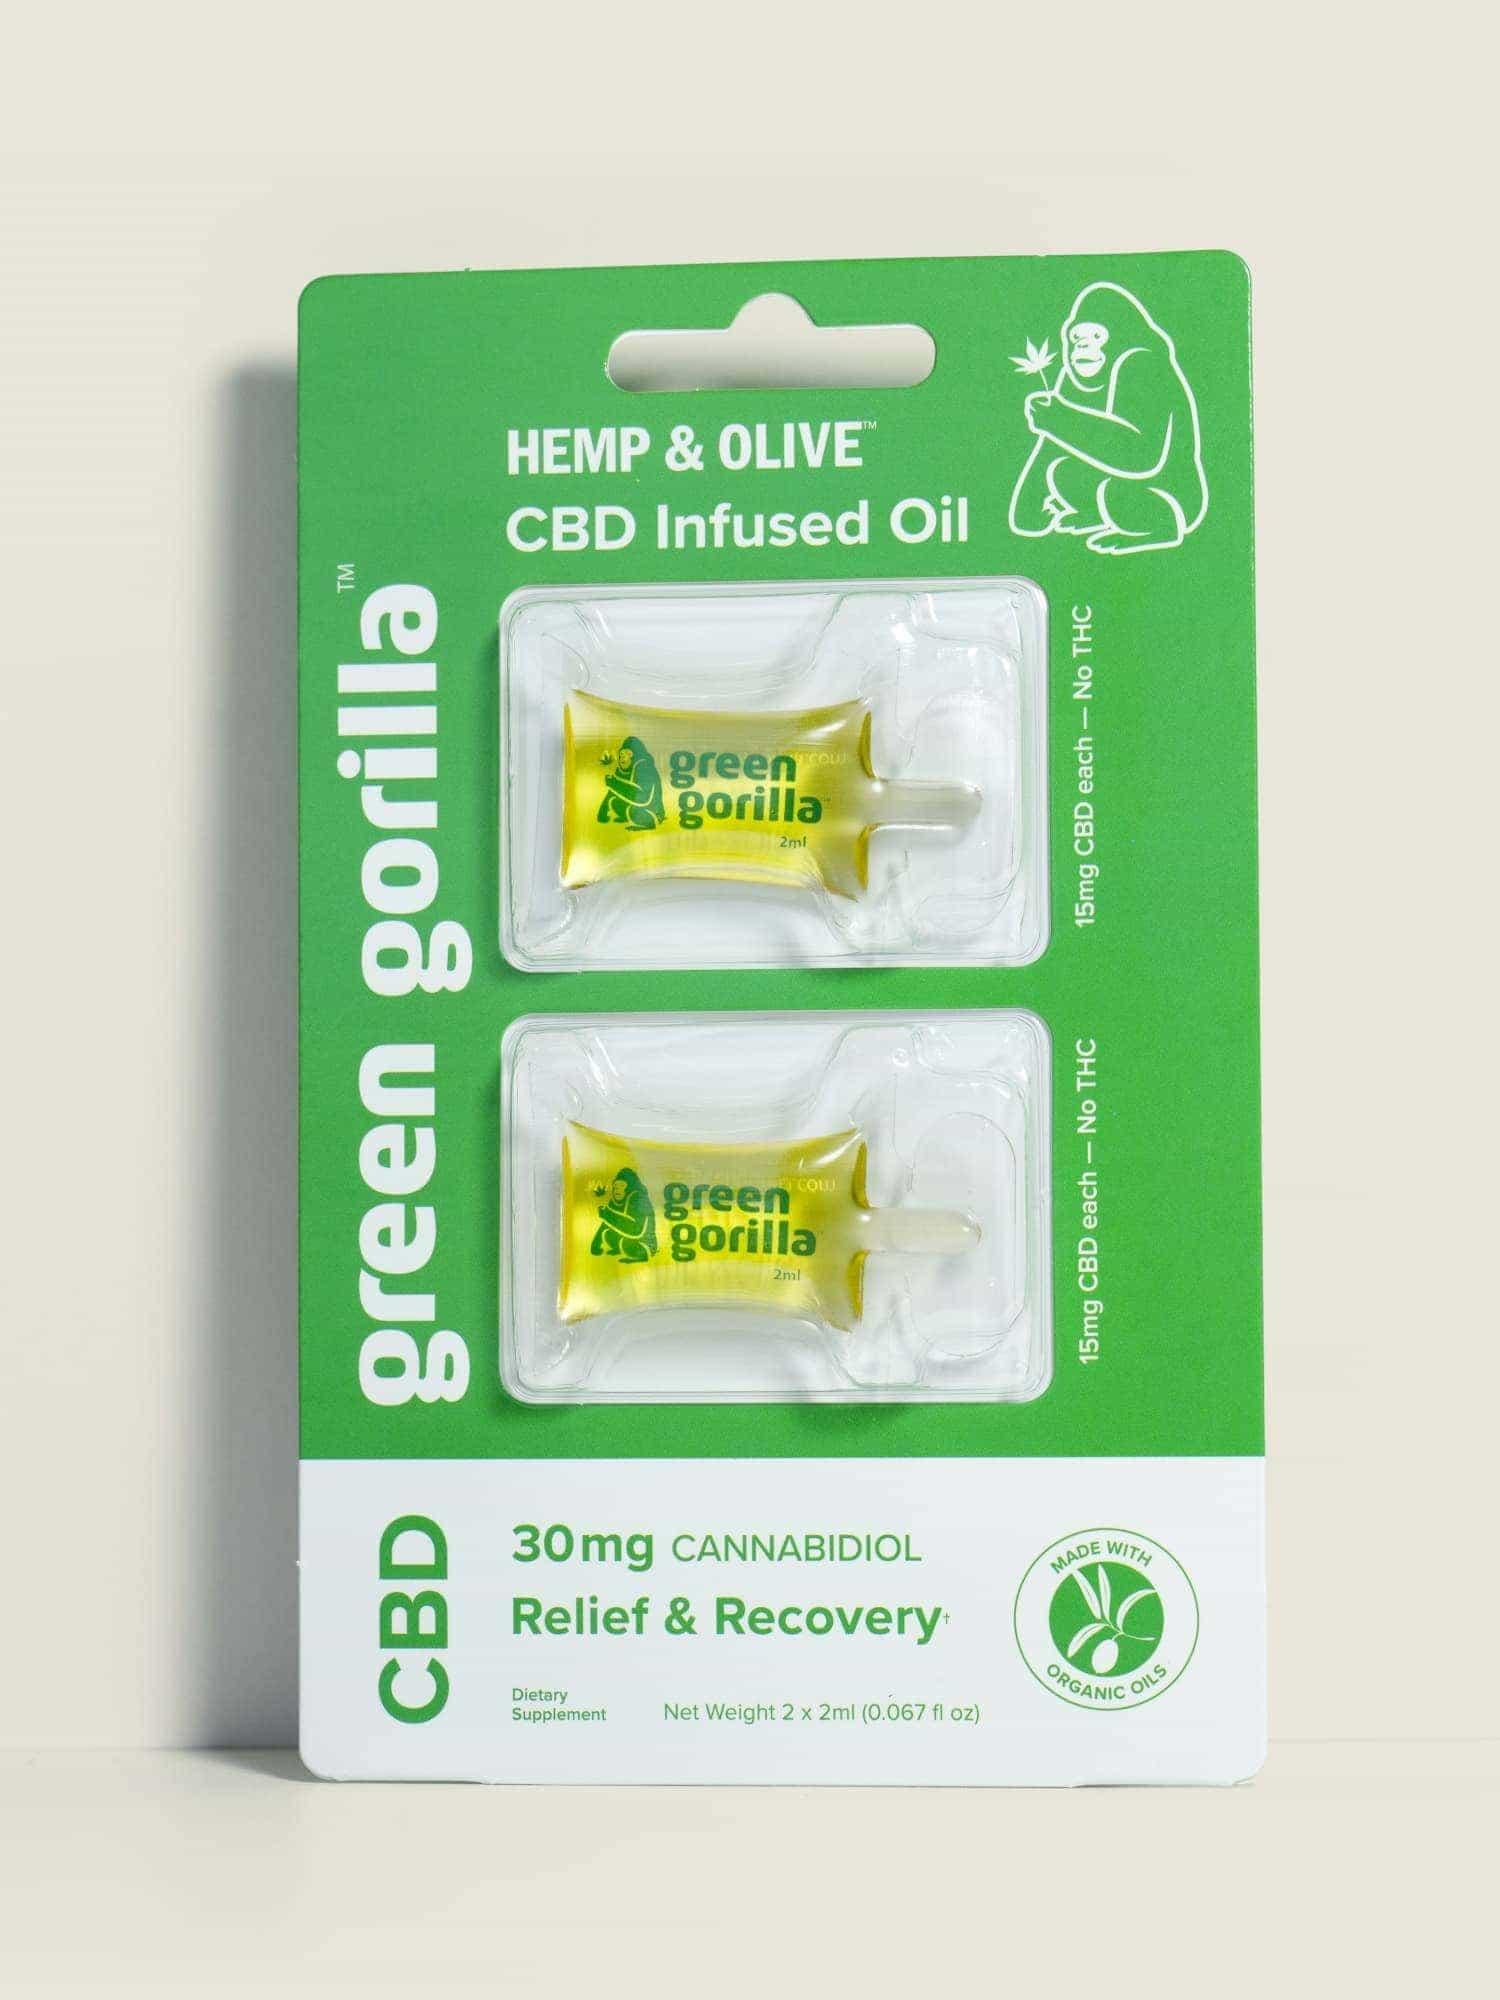 USDA Certified Organic Pure CBD oil single serve blisterpacks - 30mg | Green Gorilla